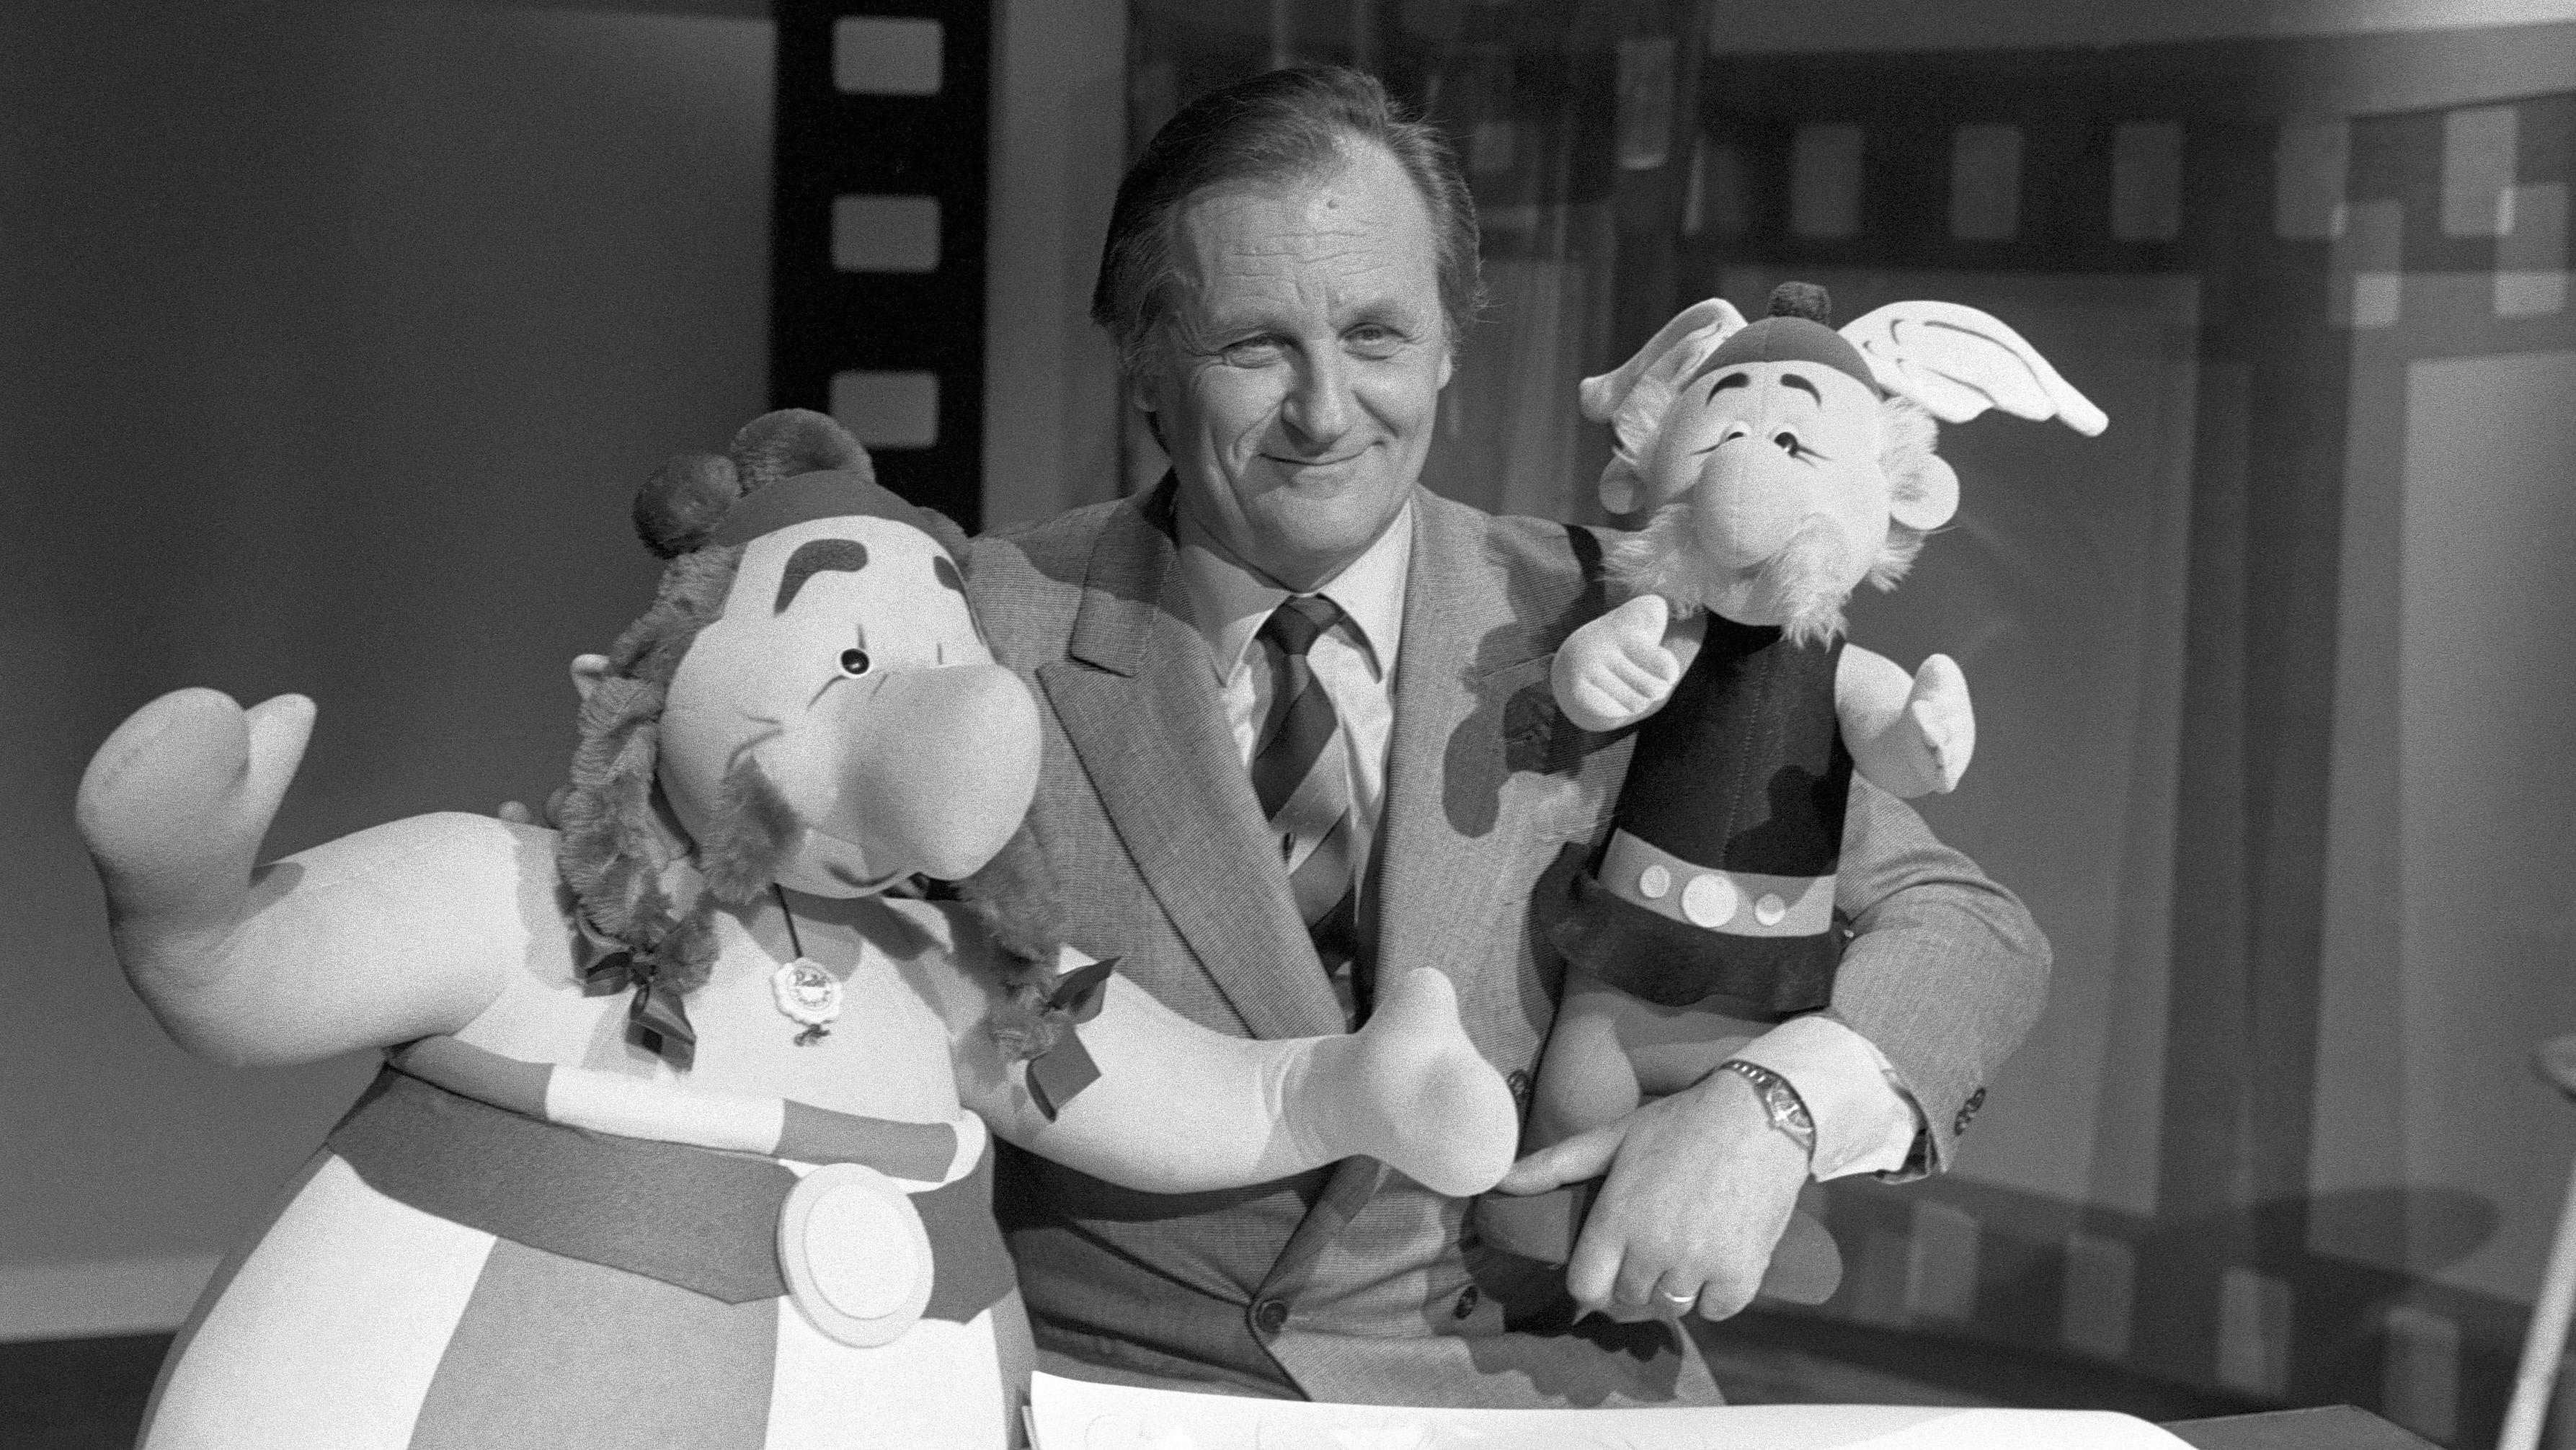 Alberto Uderzo mit Asterix und Obelix